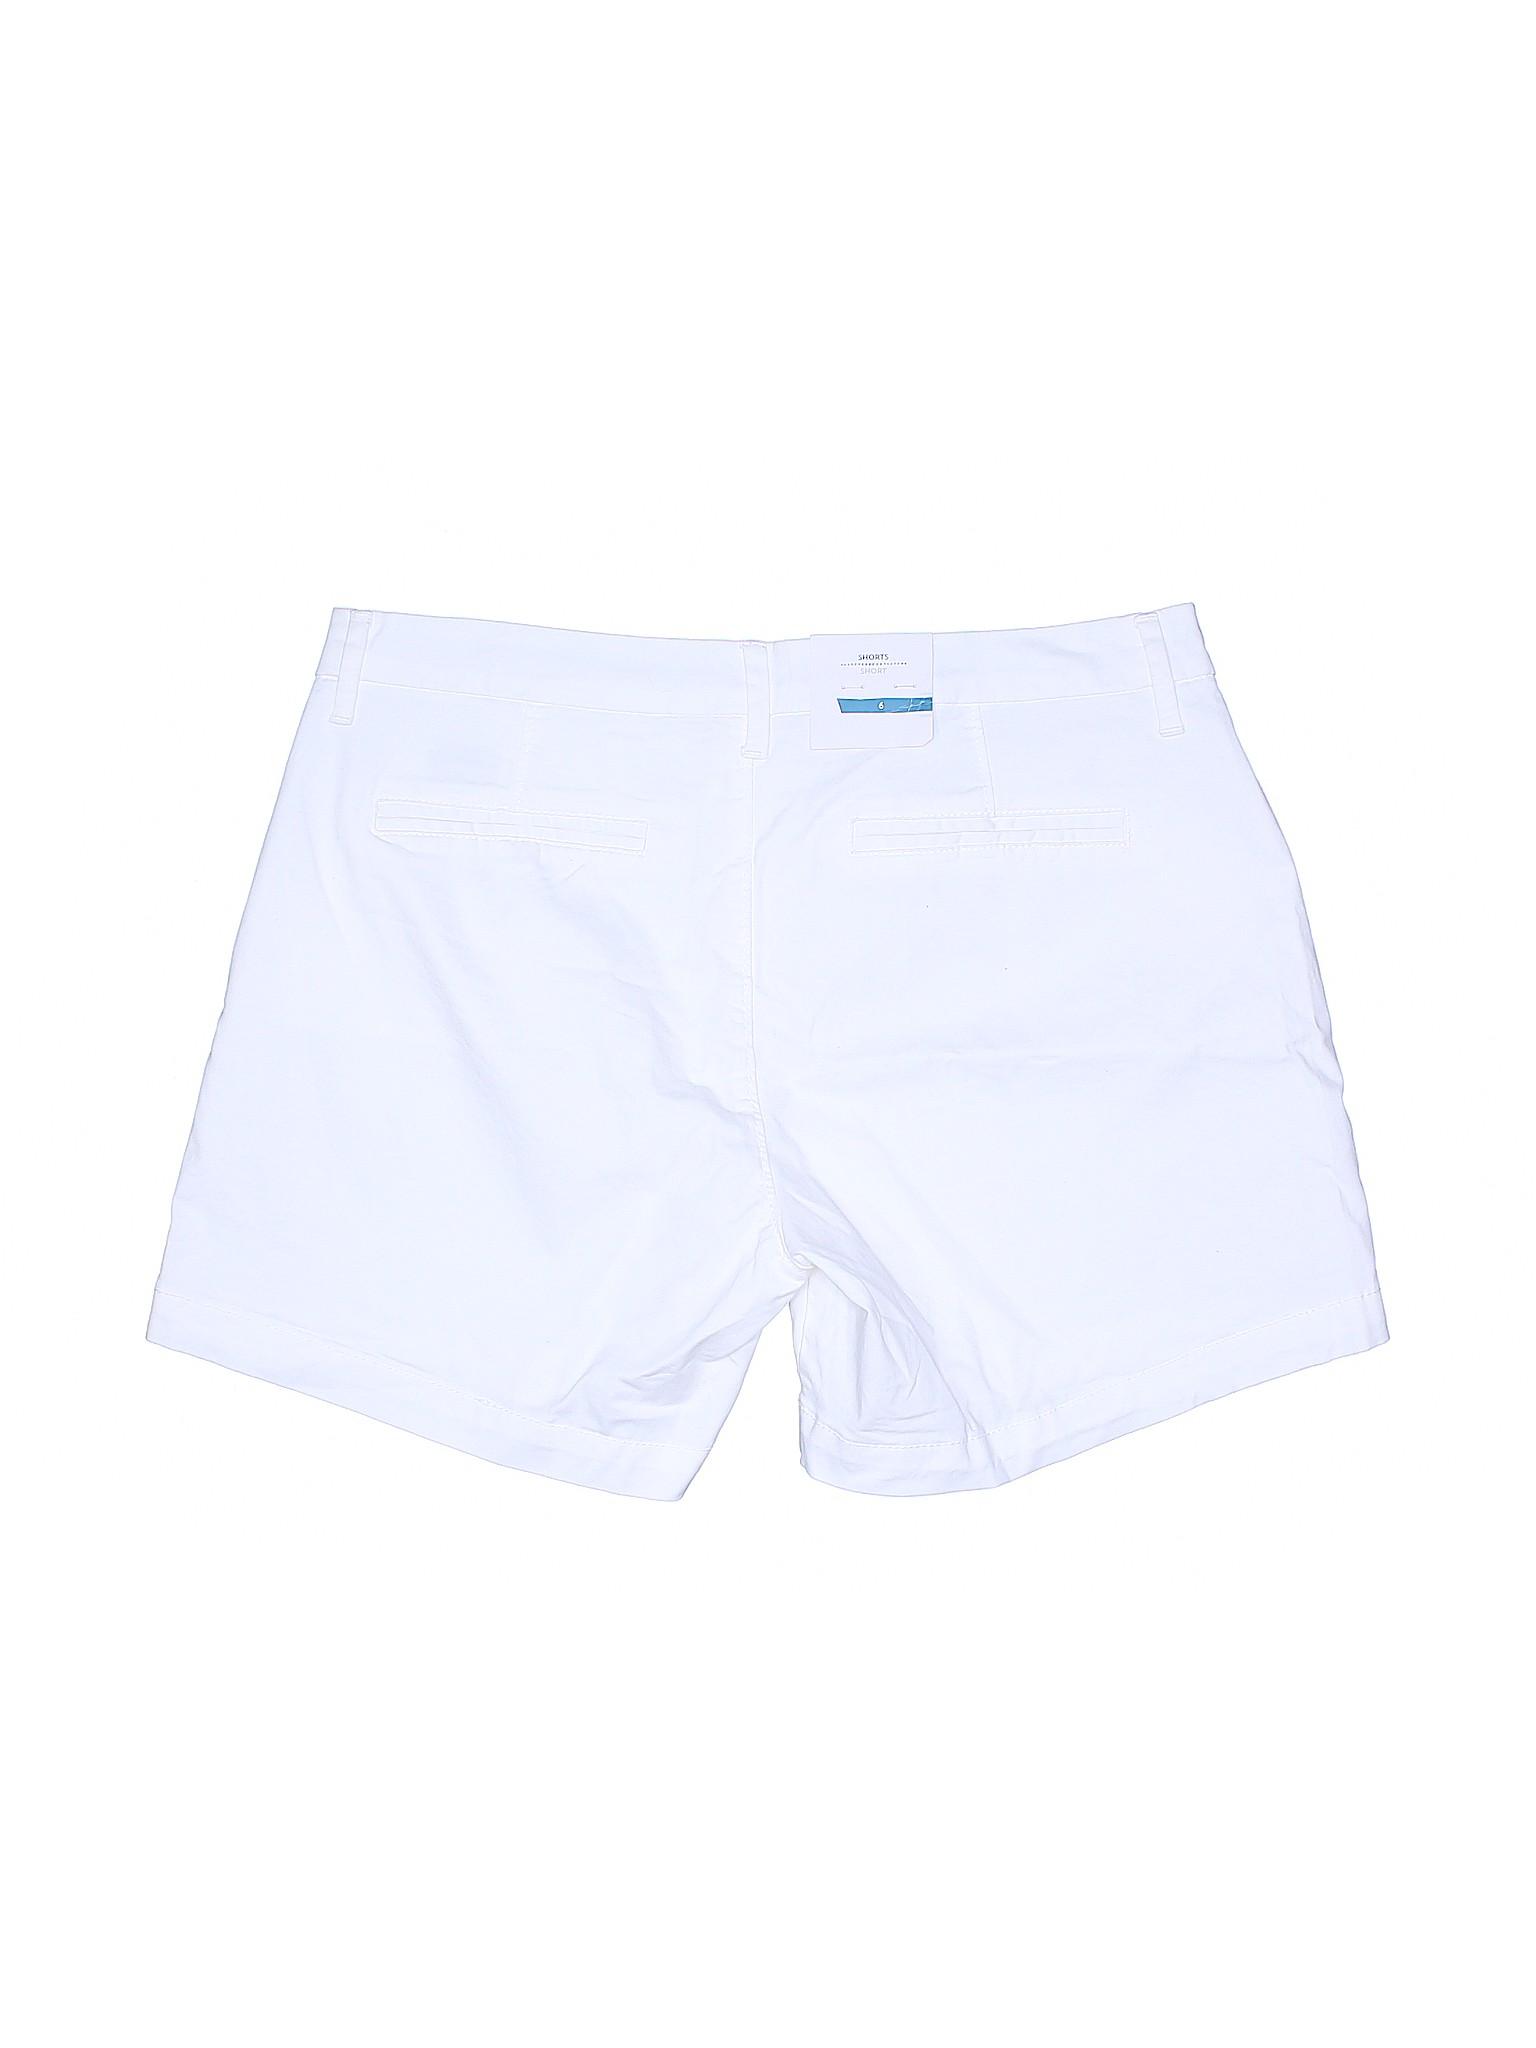 Khaki Boutique Khaki Old Navy Navy Navy Old Shorts Boutique Shorts Boutique Old x6t0wAvwqW